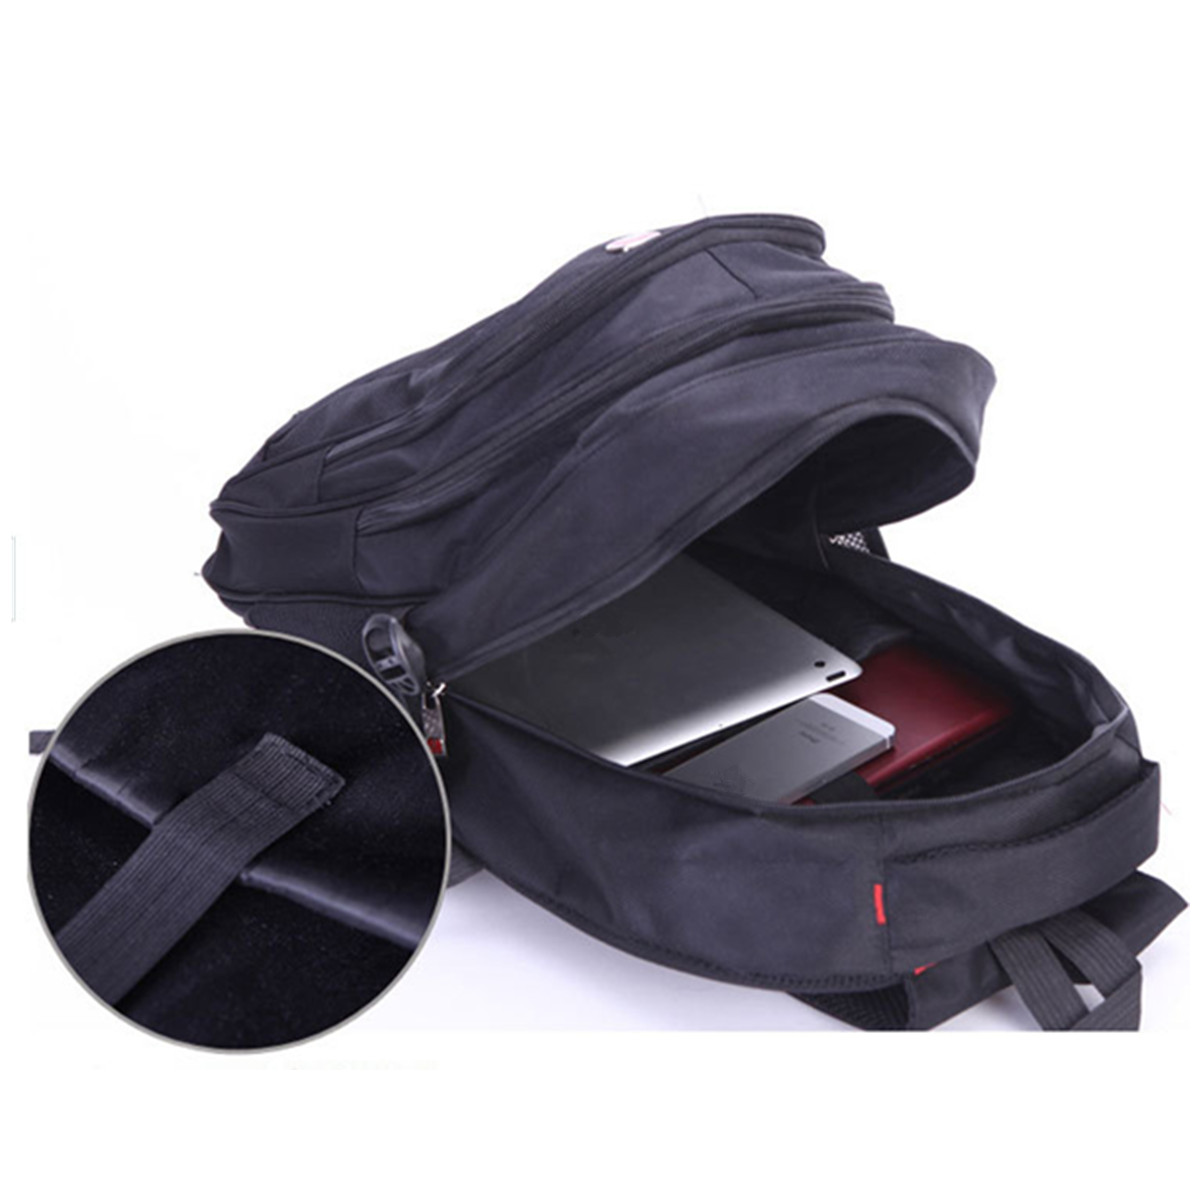 21L Men Waterproof Nylon Backpack Rucksack 15inch Laptop Satchel School Sports Travel Shoulder Bag